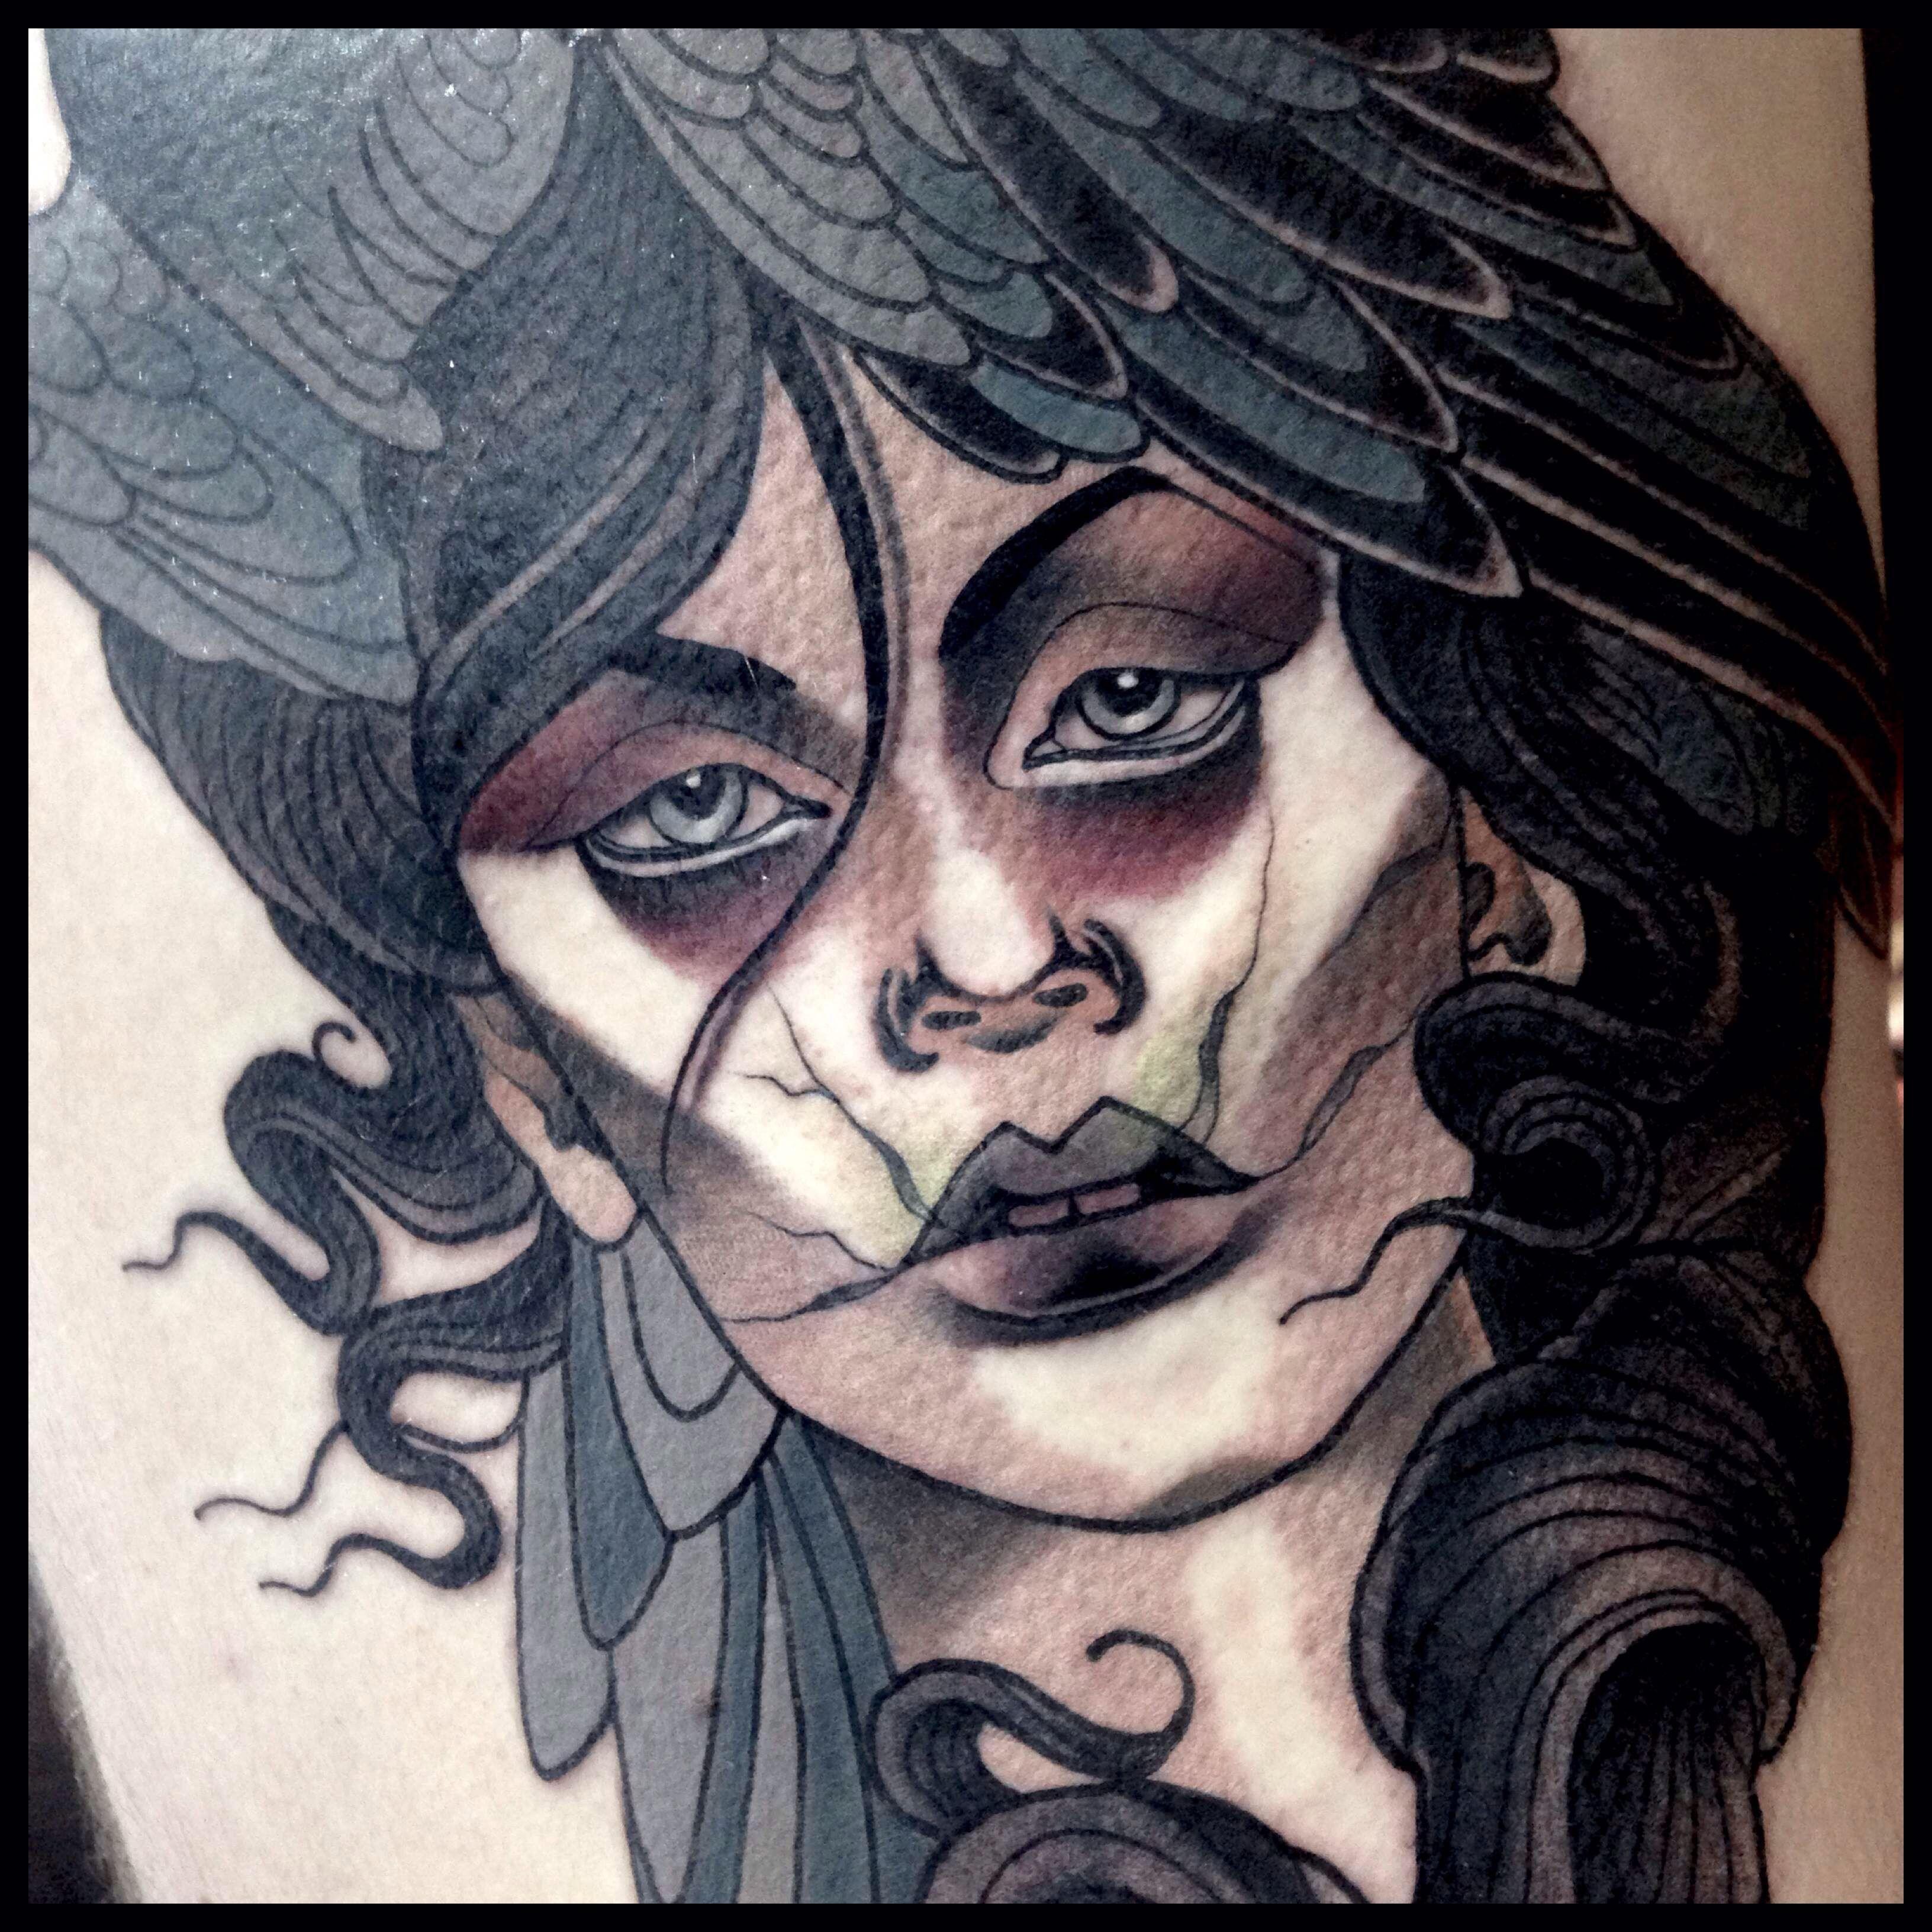 #tattoo #neotraditional #ladyhead #birdtattoo #colourtattoo #girl #tahnee_claire #ironmindtattoo #brunswickheads